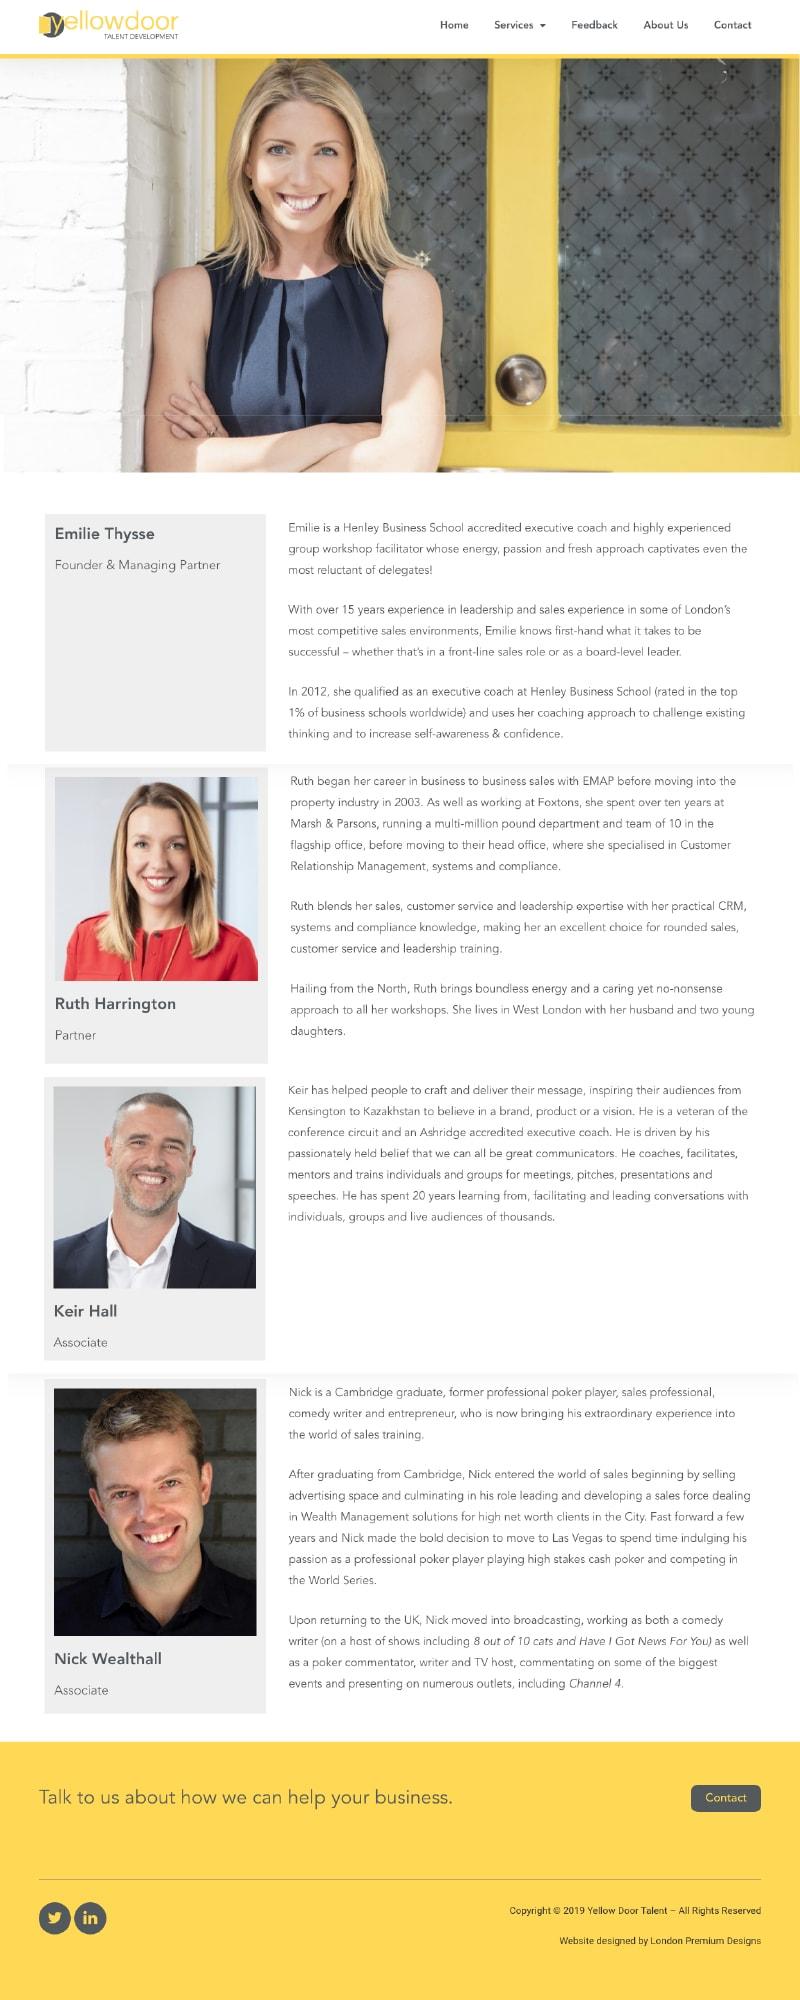 Yellowdoor case study team page